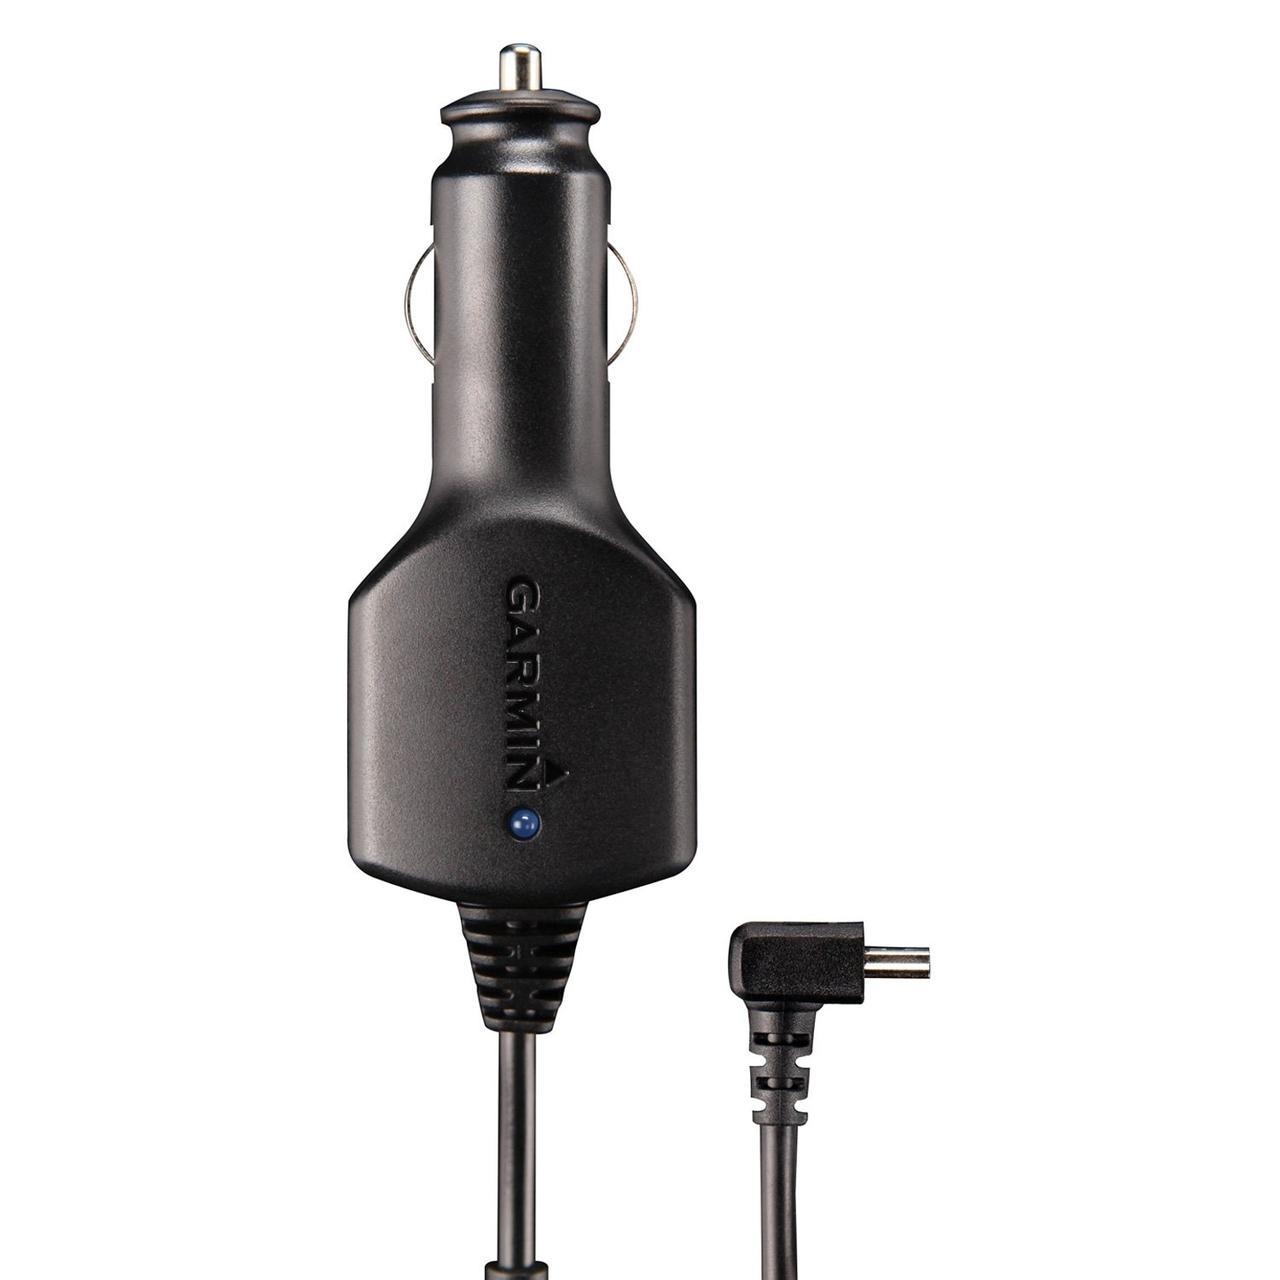 Автомобильное зарядное устройство для навигаторов Garmin Nuvi/Zumo/eTrex